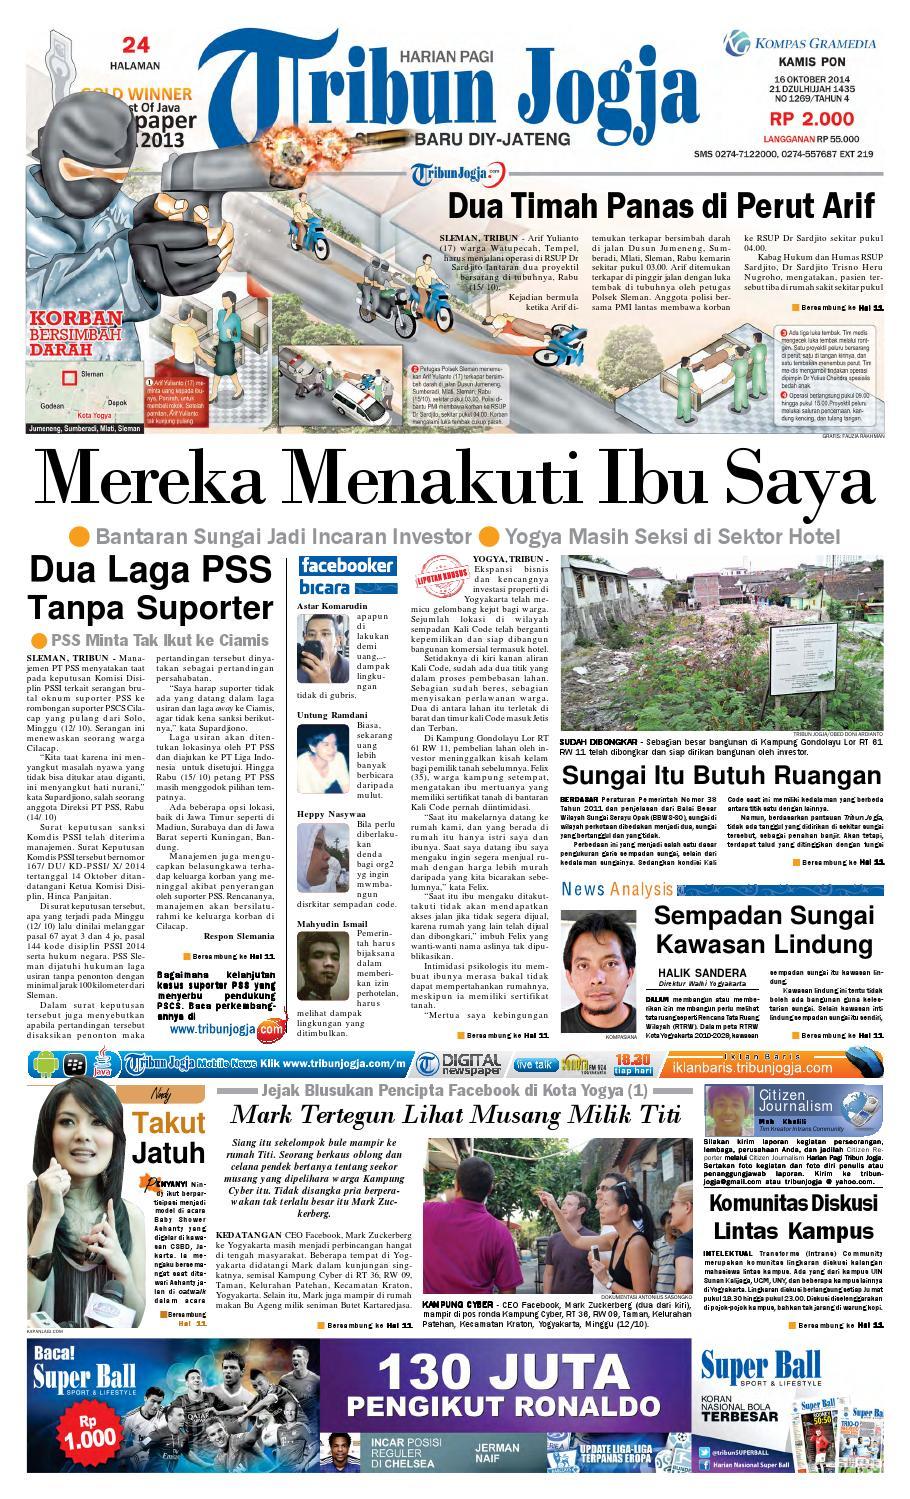 Tribunjogja 16 10 2014 By Tribun Jogja Issuu Produk Ukm Bumn Barbekyu Kelitik Surabaya